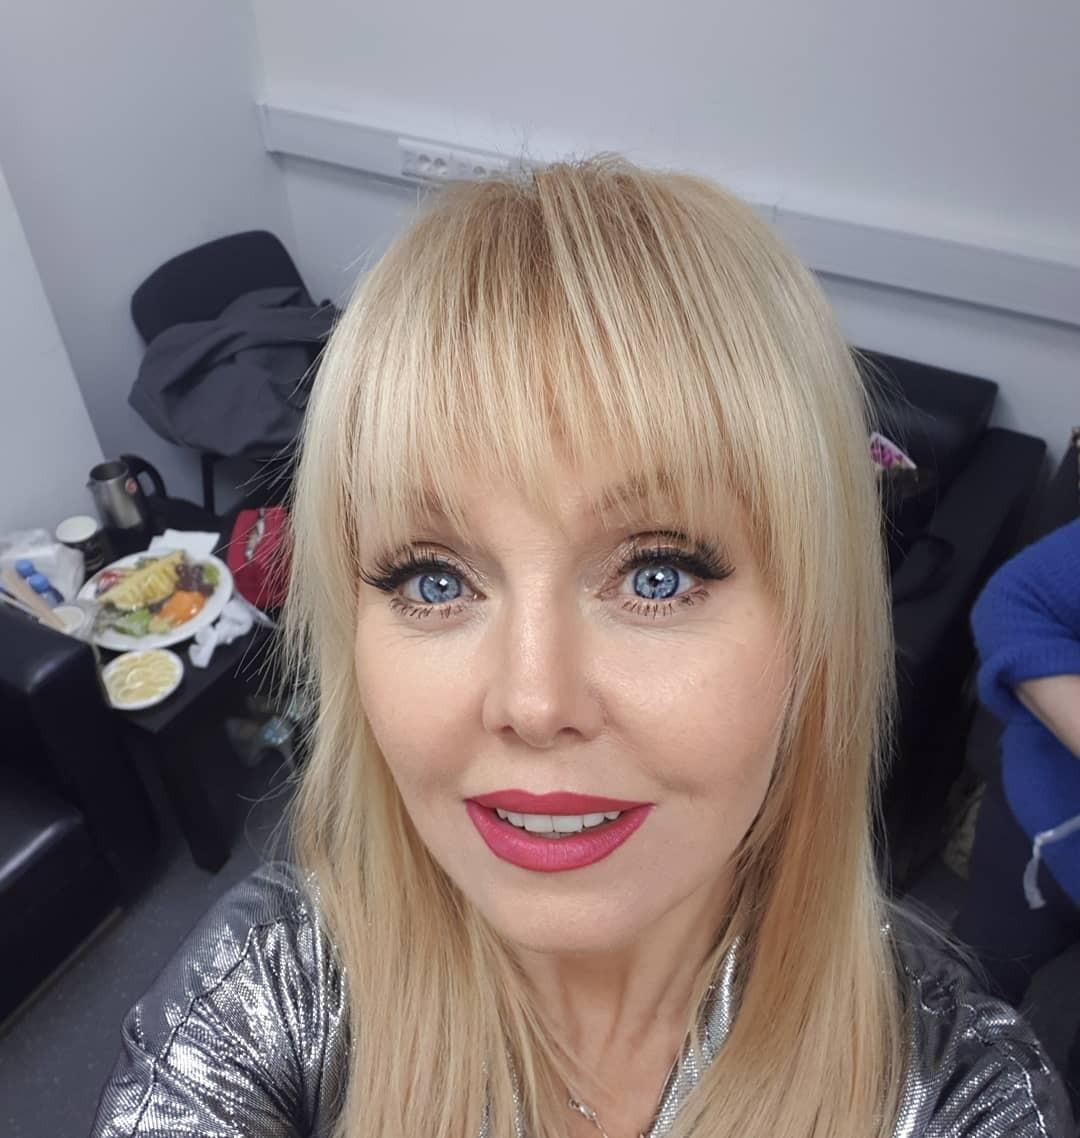 «Правда жизни»: постаревшая певица Валерия опубликвала фото без грима